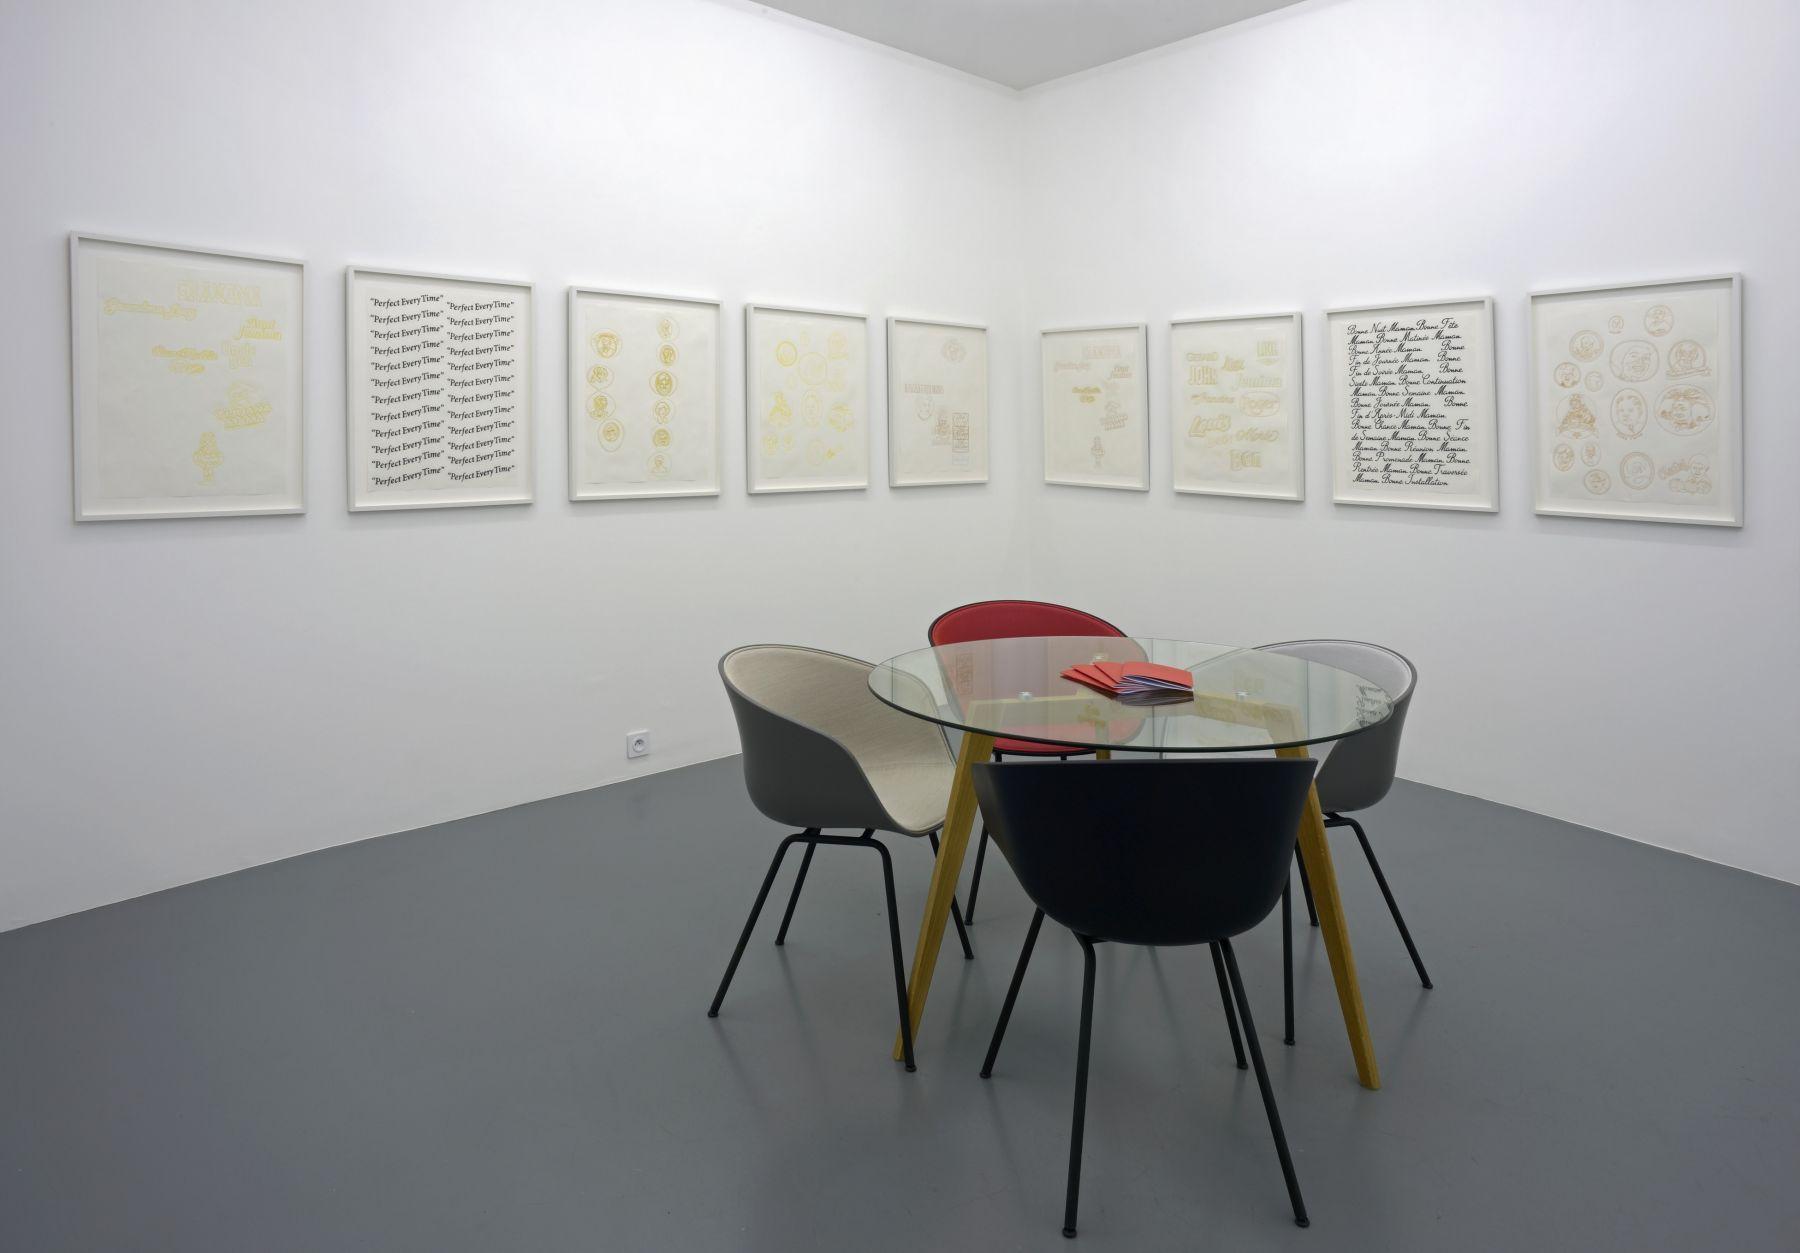 "Valérie Mréjen, ""Roots"", Galerie Anne-Sarah Bénichou, Paris, France, September 6th - October 23rd, 2016, Courtesy Galerie Anne-Sarah Bénichou"